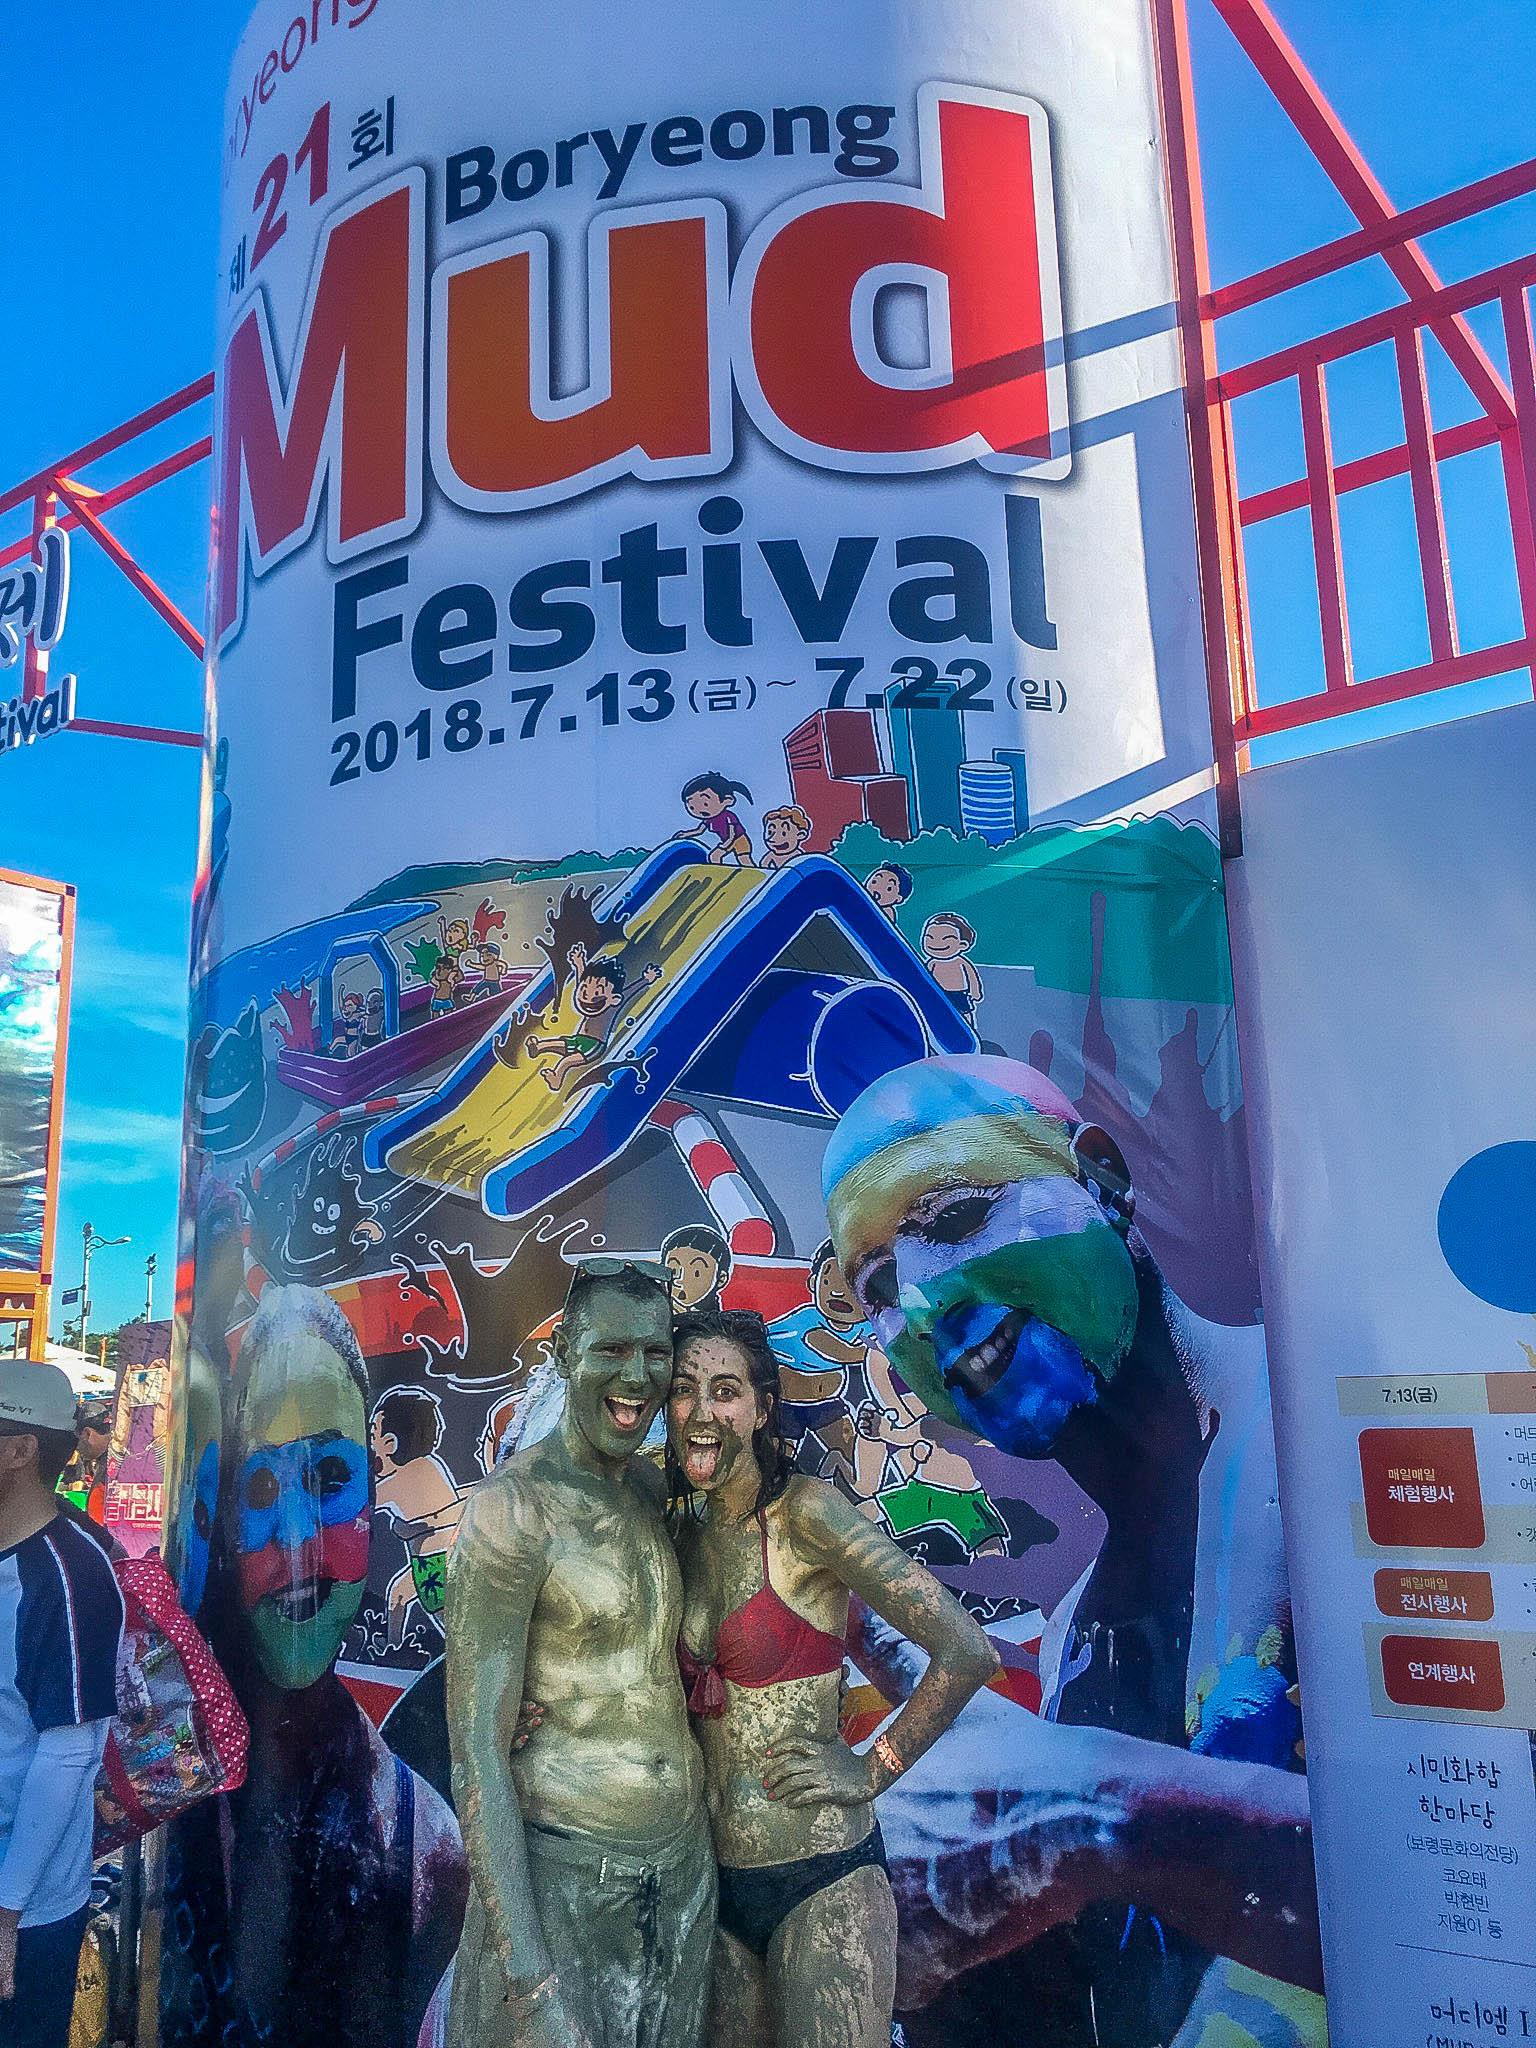 20180714-IMG_9338 (1)_boryeong-mud.jpg